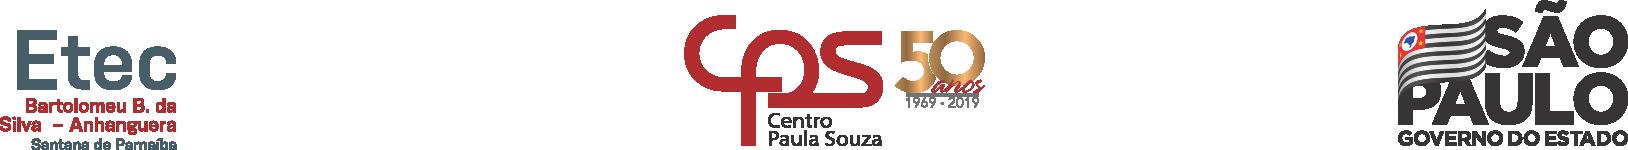 centro paula souza - etec anhanguera